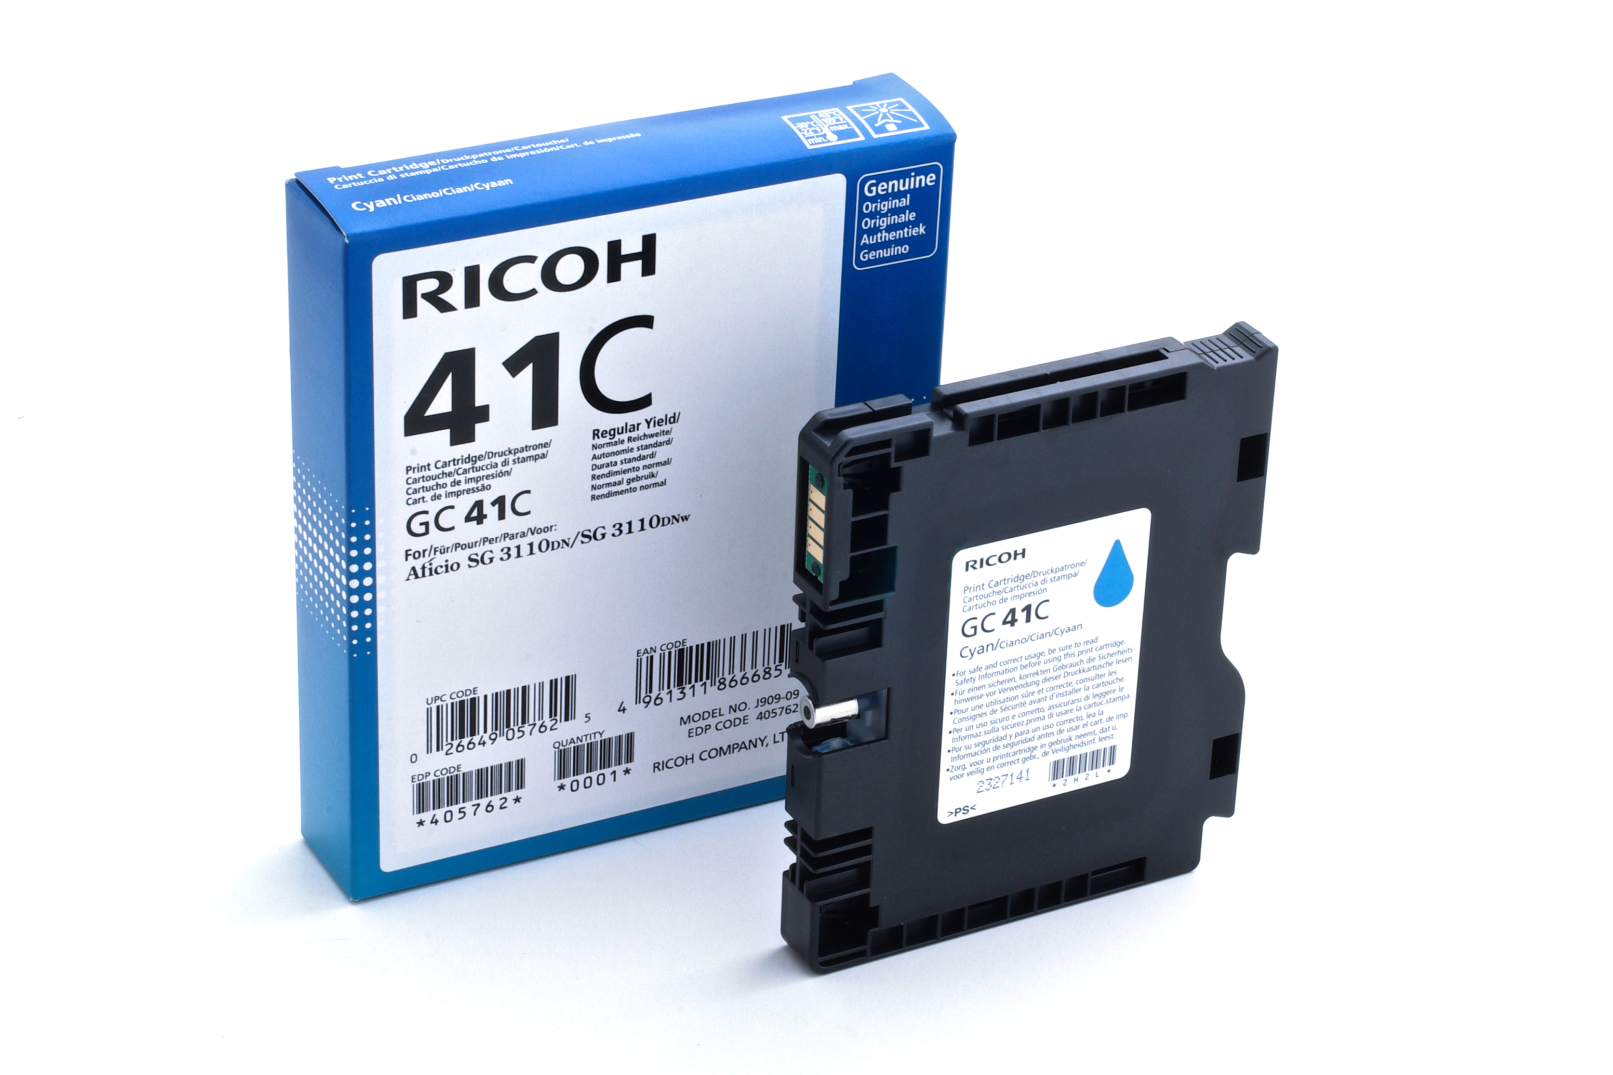 Ricoh - toner 405762 (SG 3110DN, 3110DNw, 3100SNw, 3110SFNw, 3120B SFNw, 7100DN) 2200 stran, azurový